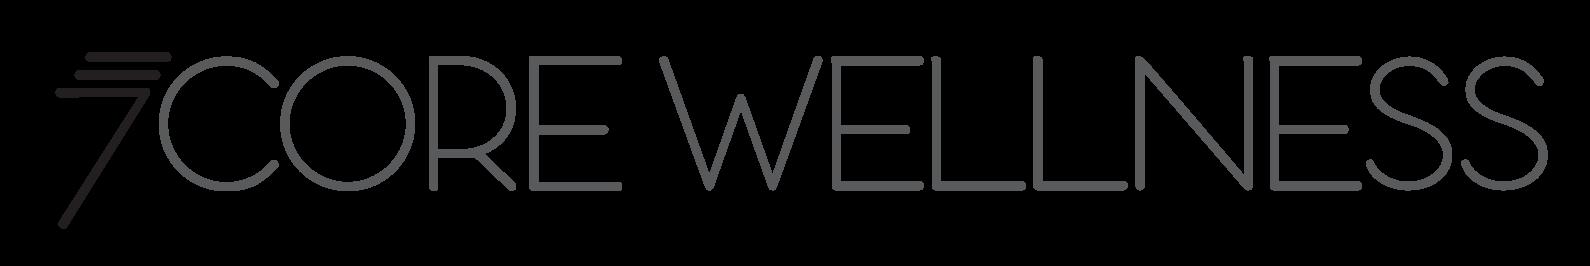 7core wellness logo